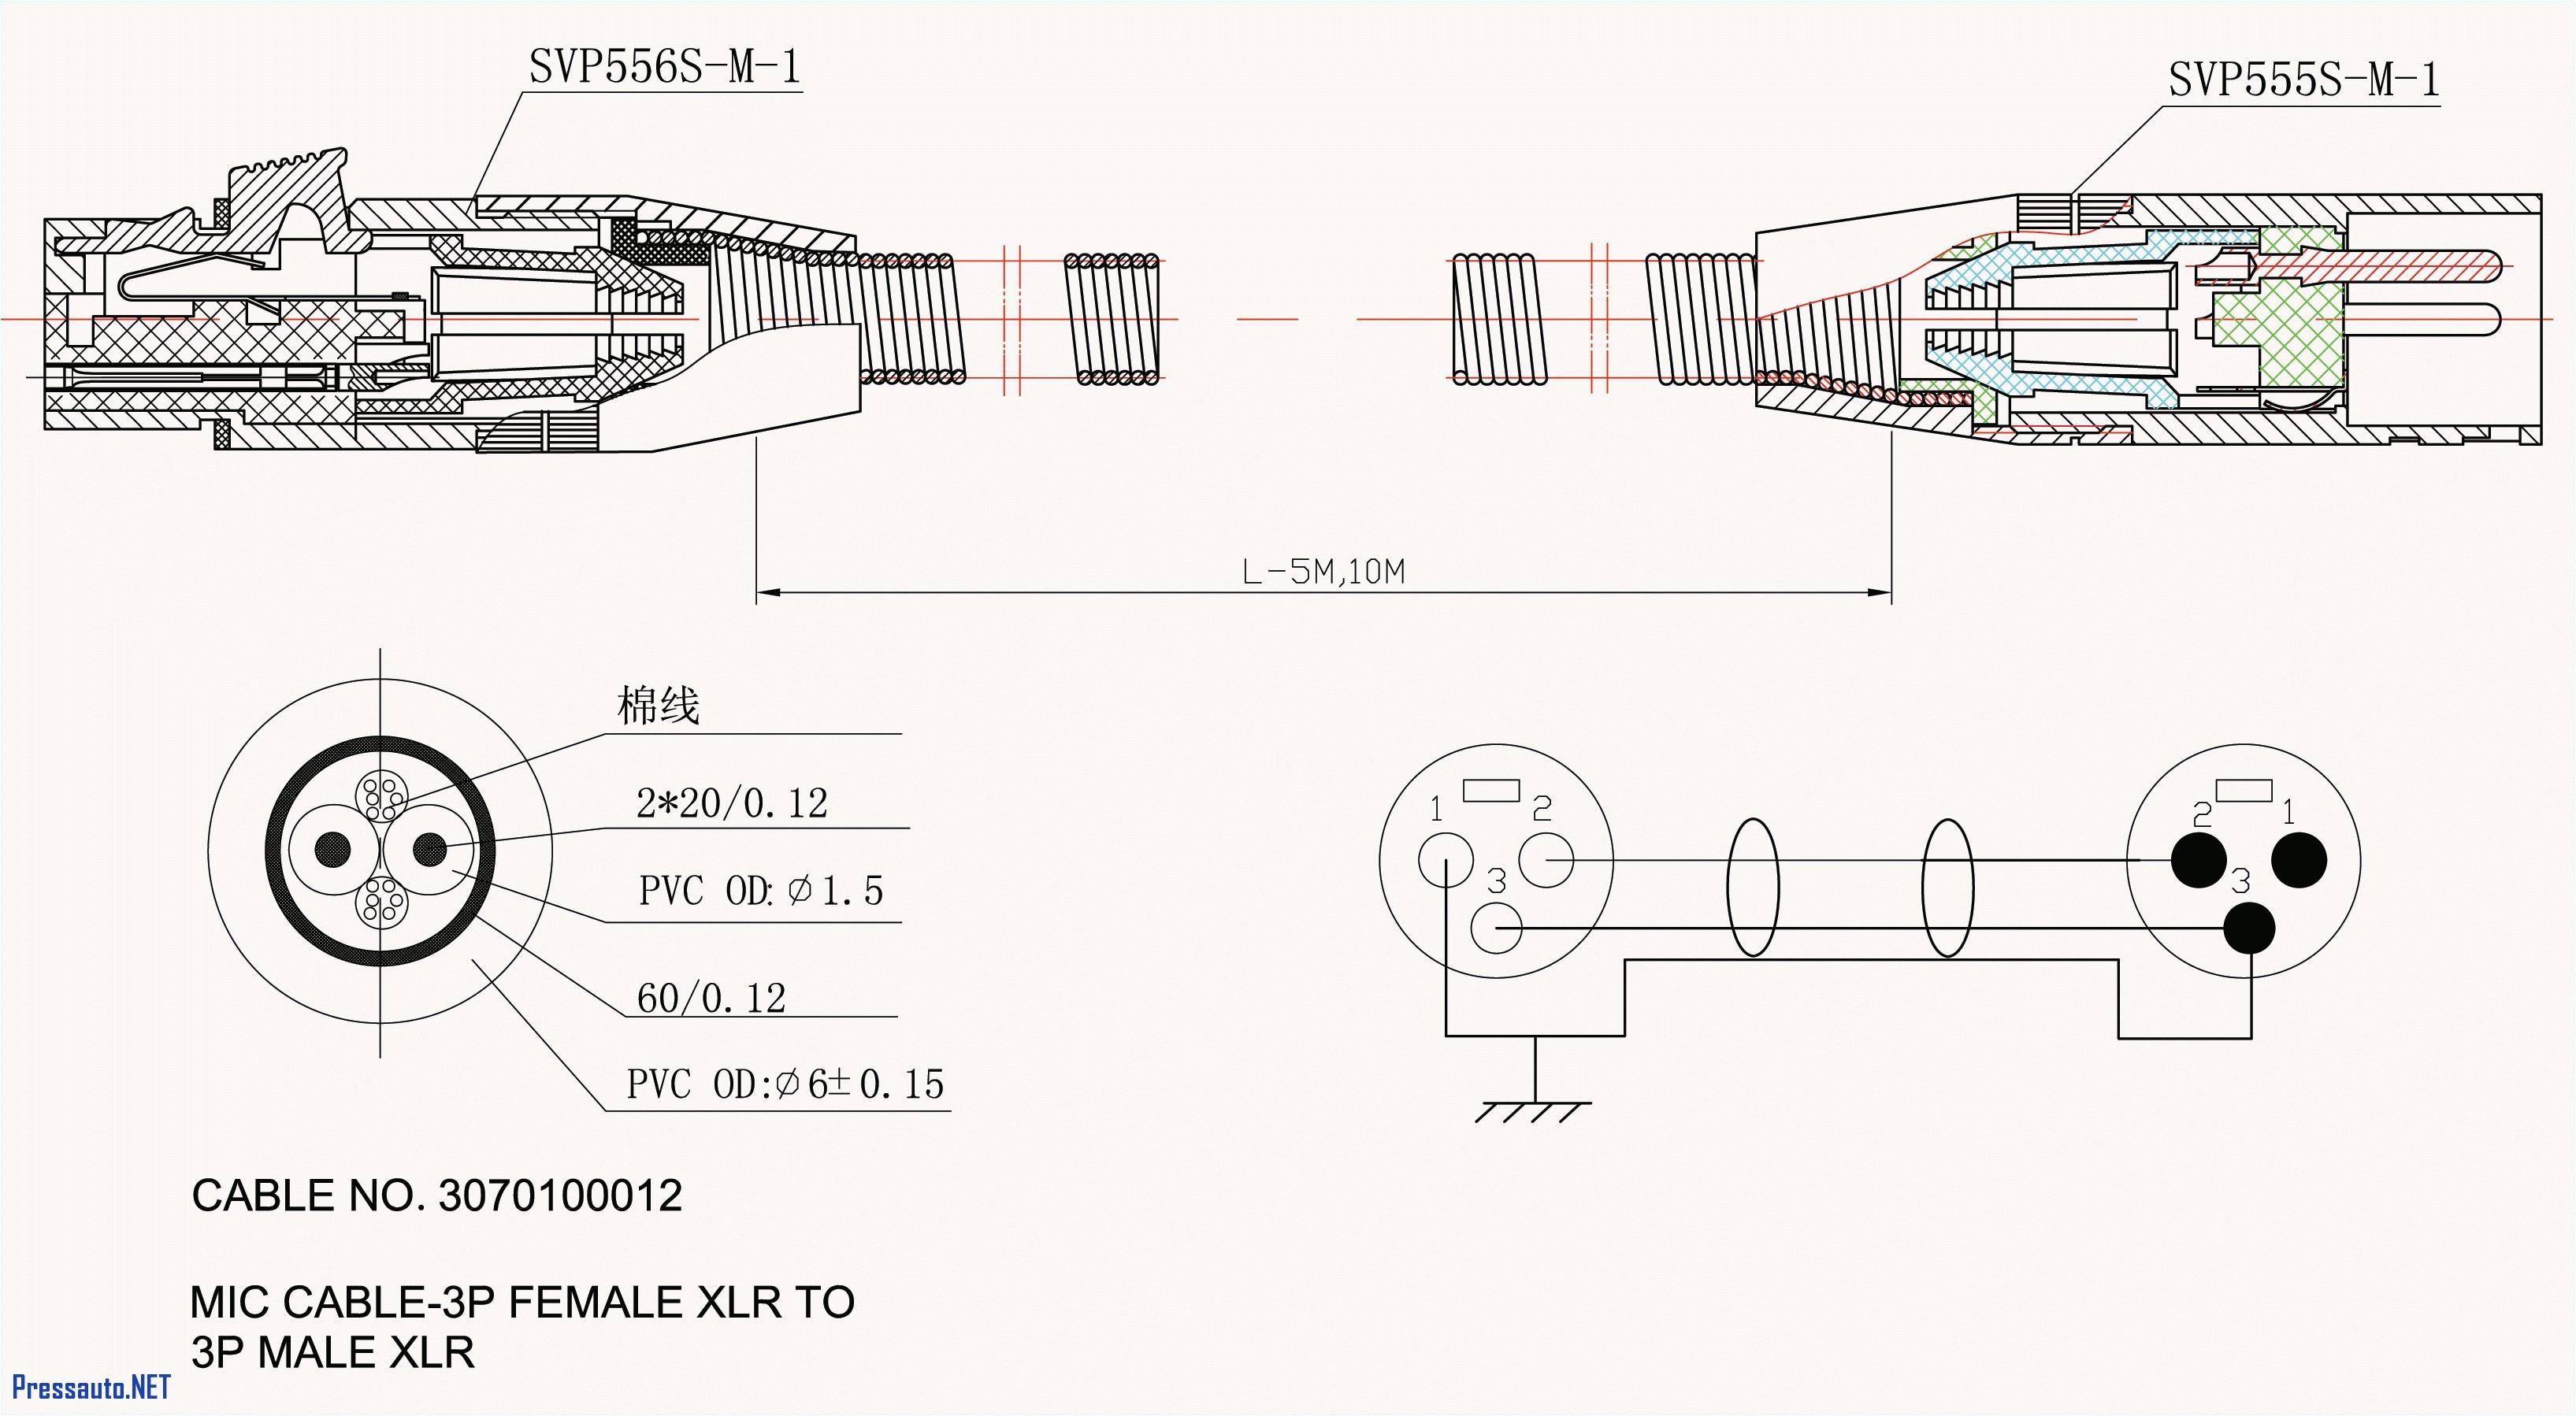 velie wiring diagram wiring diagram blogth8320wf1029 wiring diagram wiring diagram velie wiring diagram